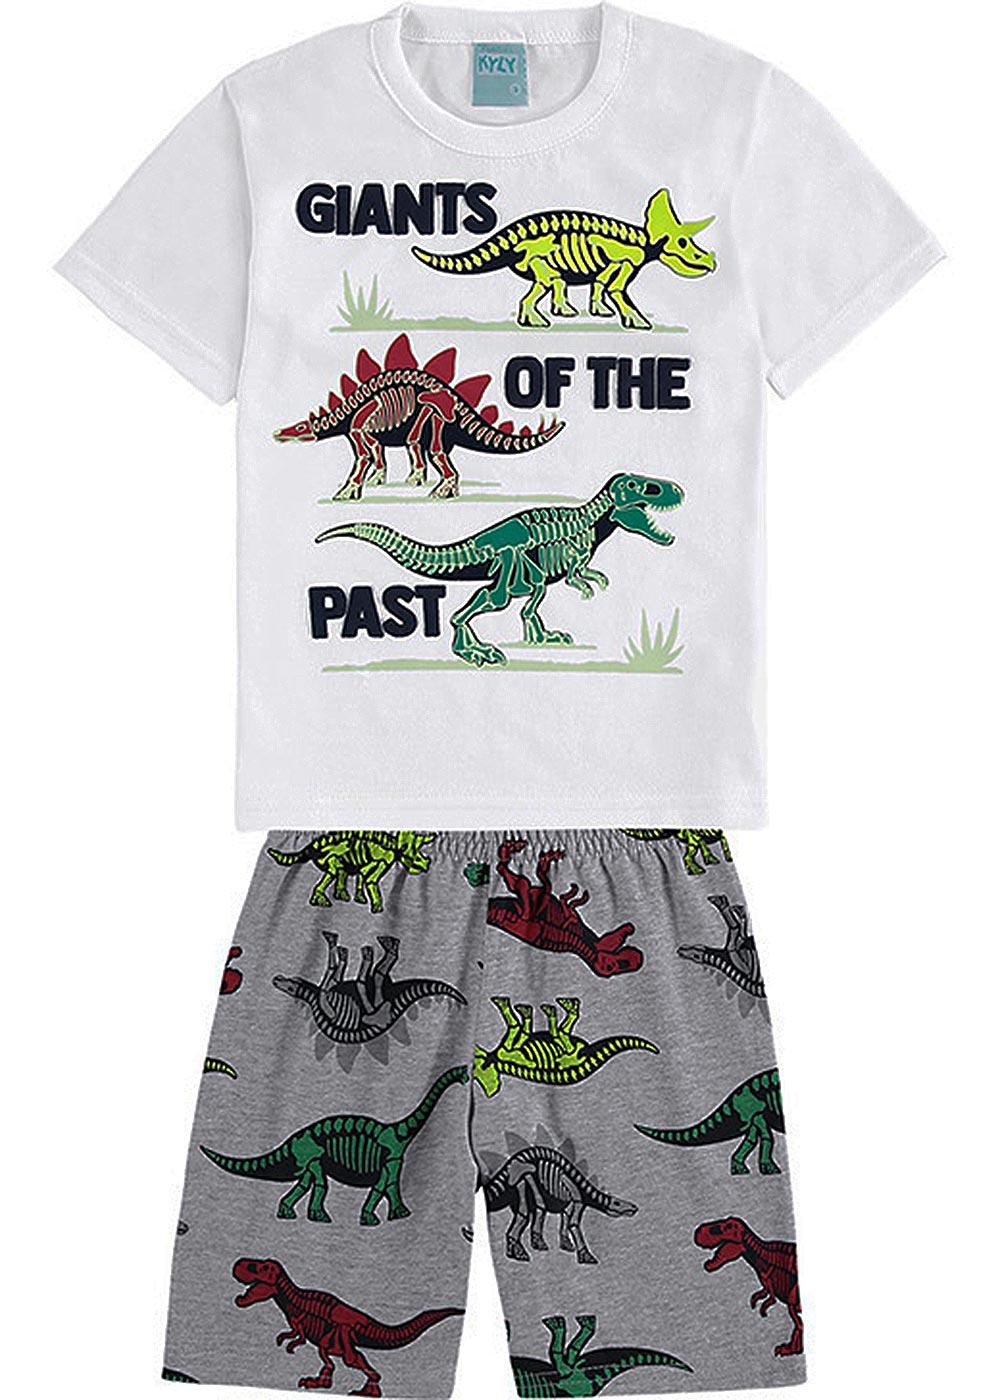 Pijama Infantil Masculino Verão Branco Giants of Past Brilha no Escuro - Kyly